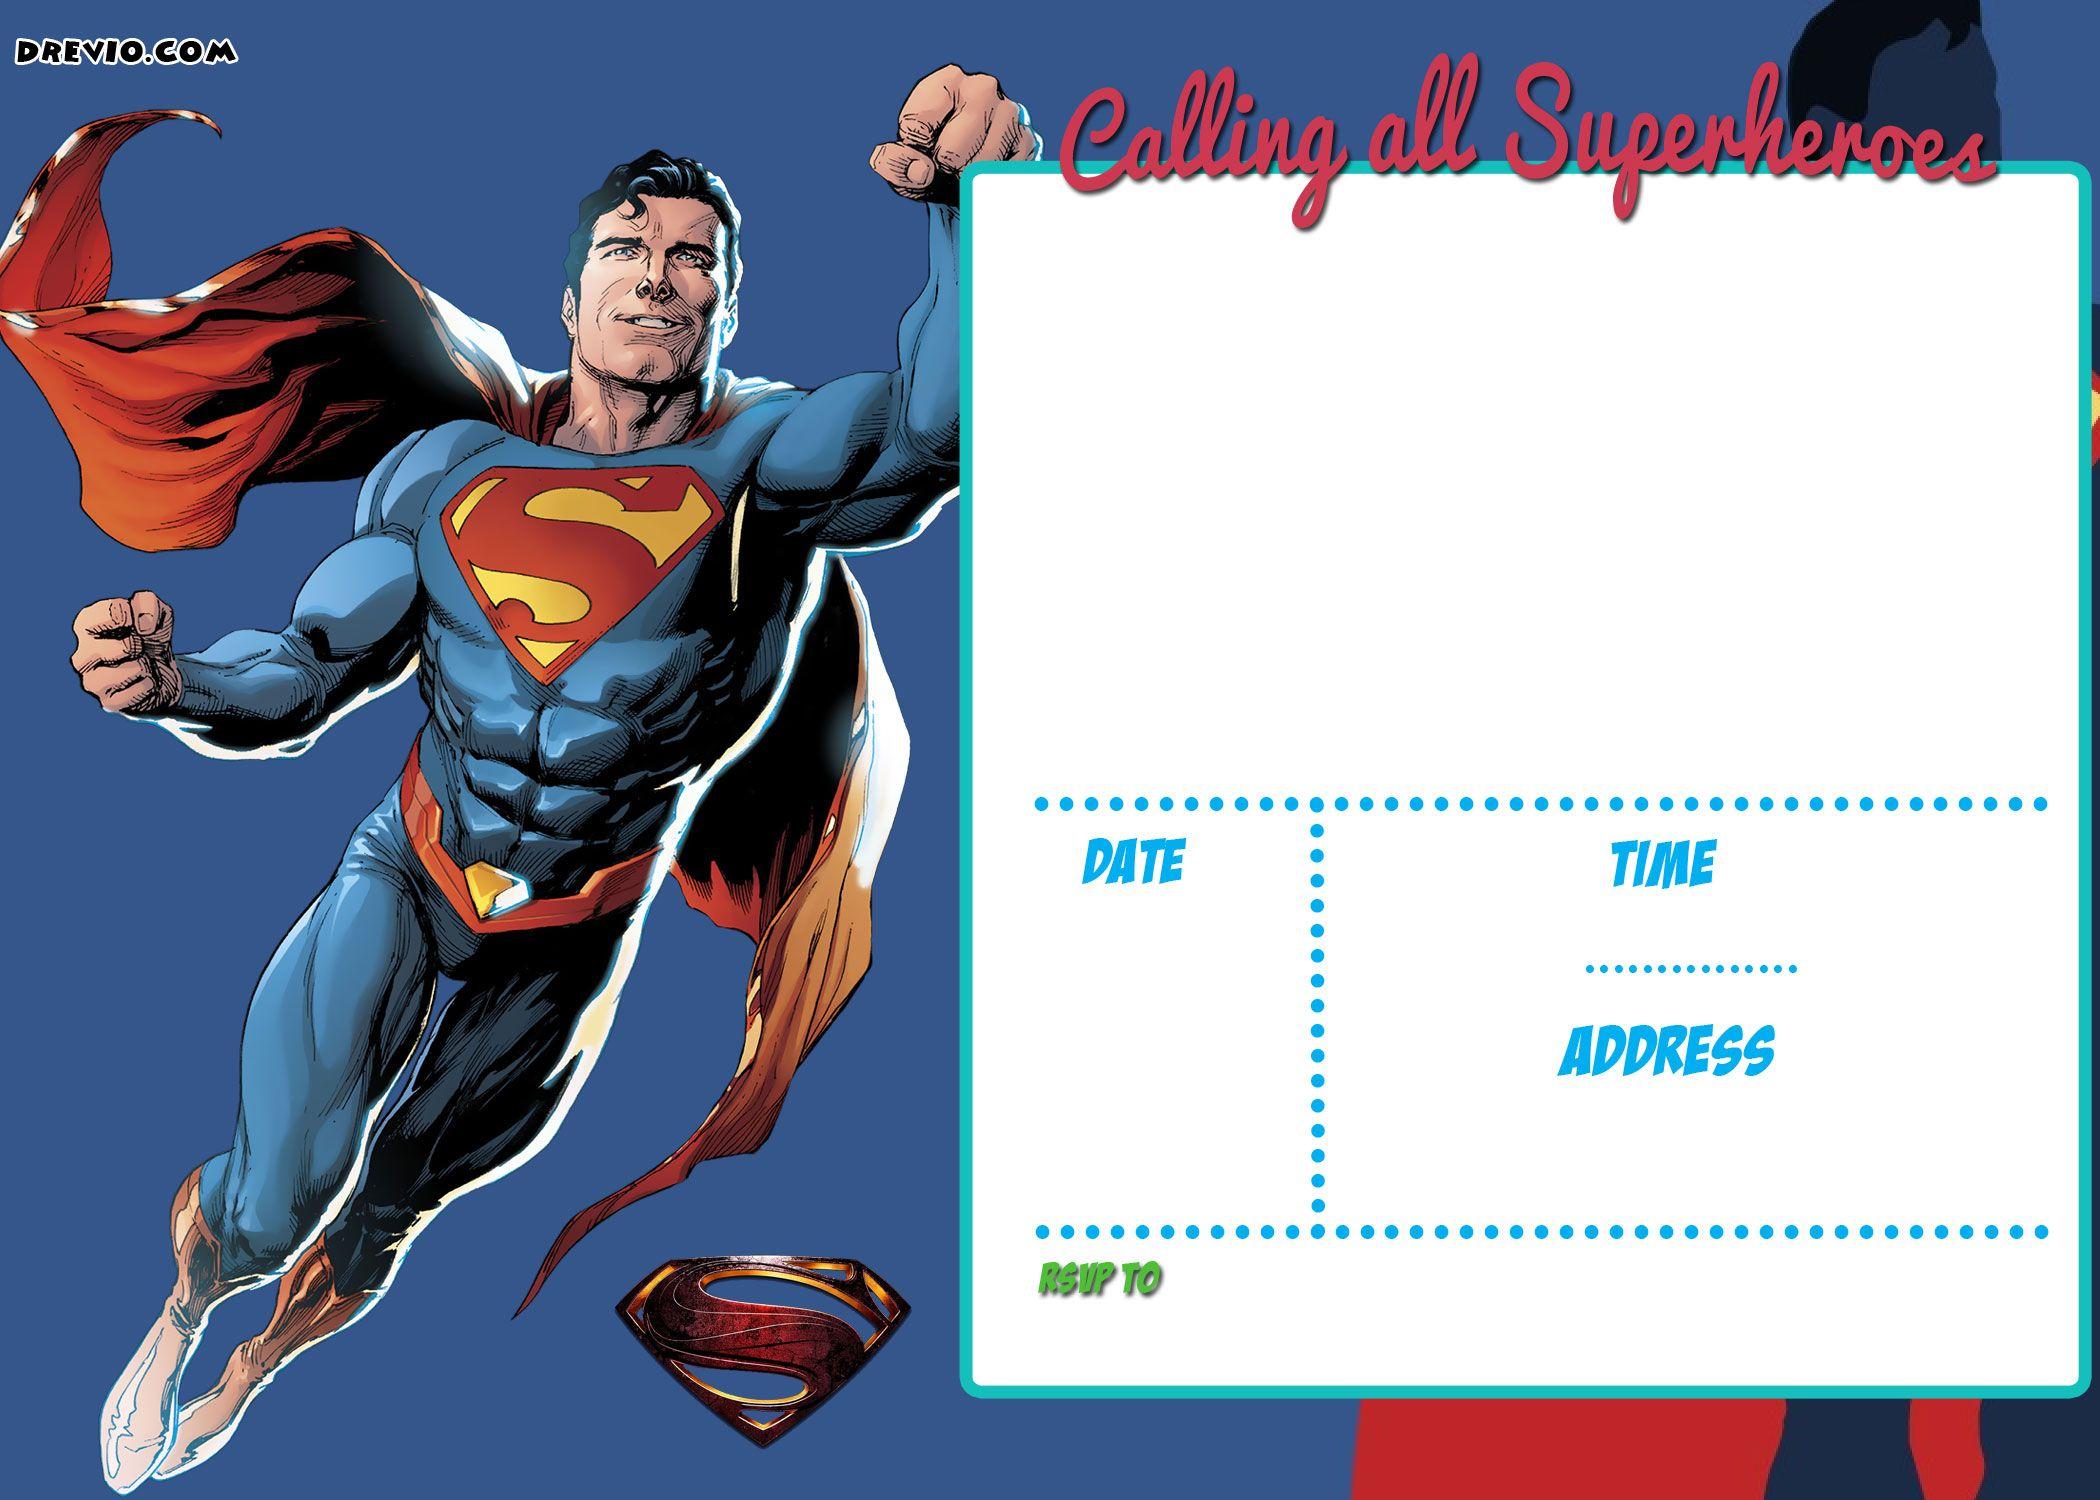 Free Printable Justice League Invitation Template | Free Printable - Free Printable Superman Invitations